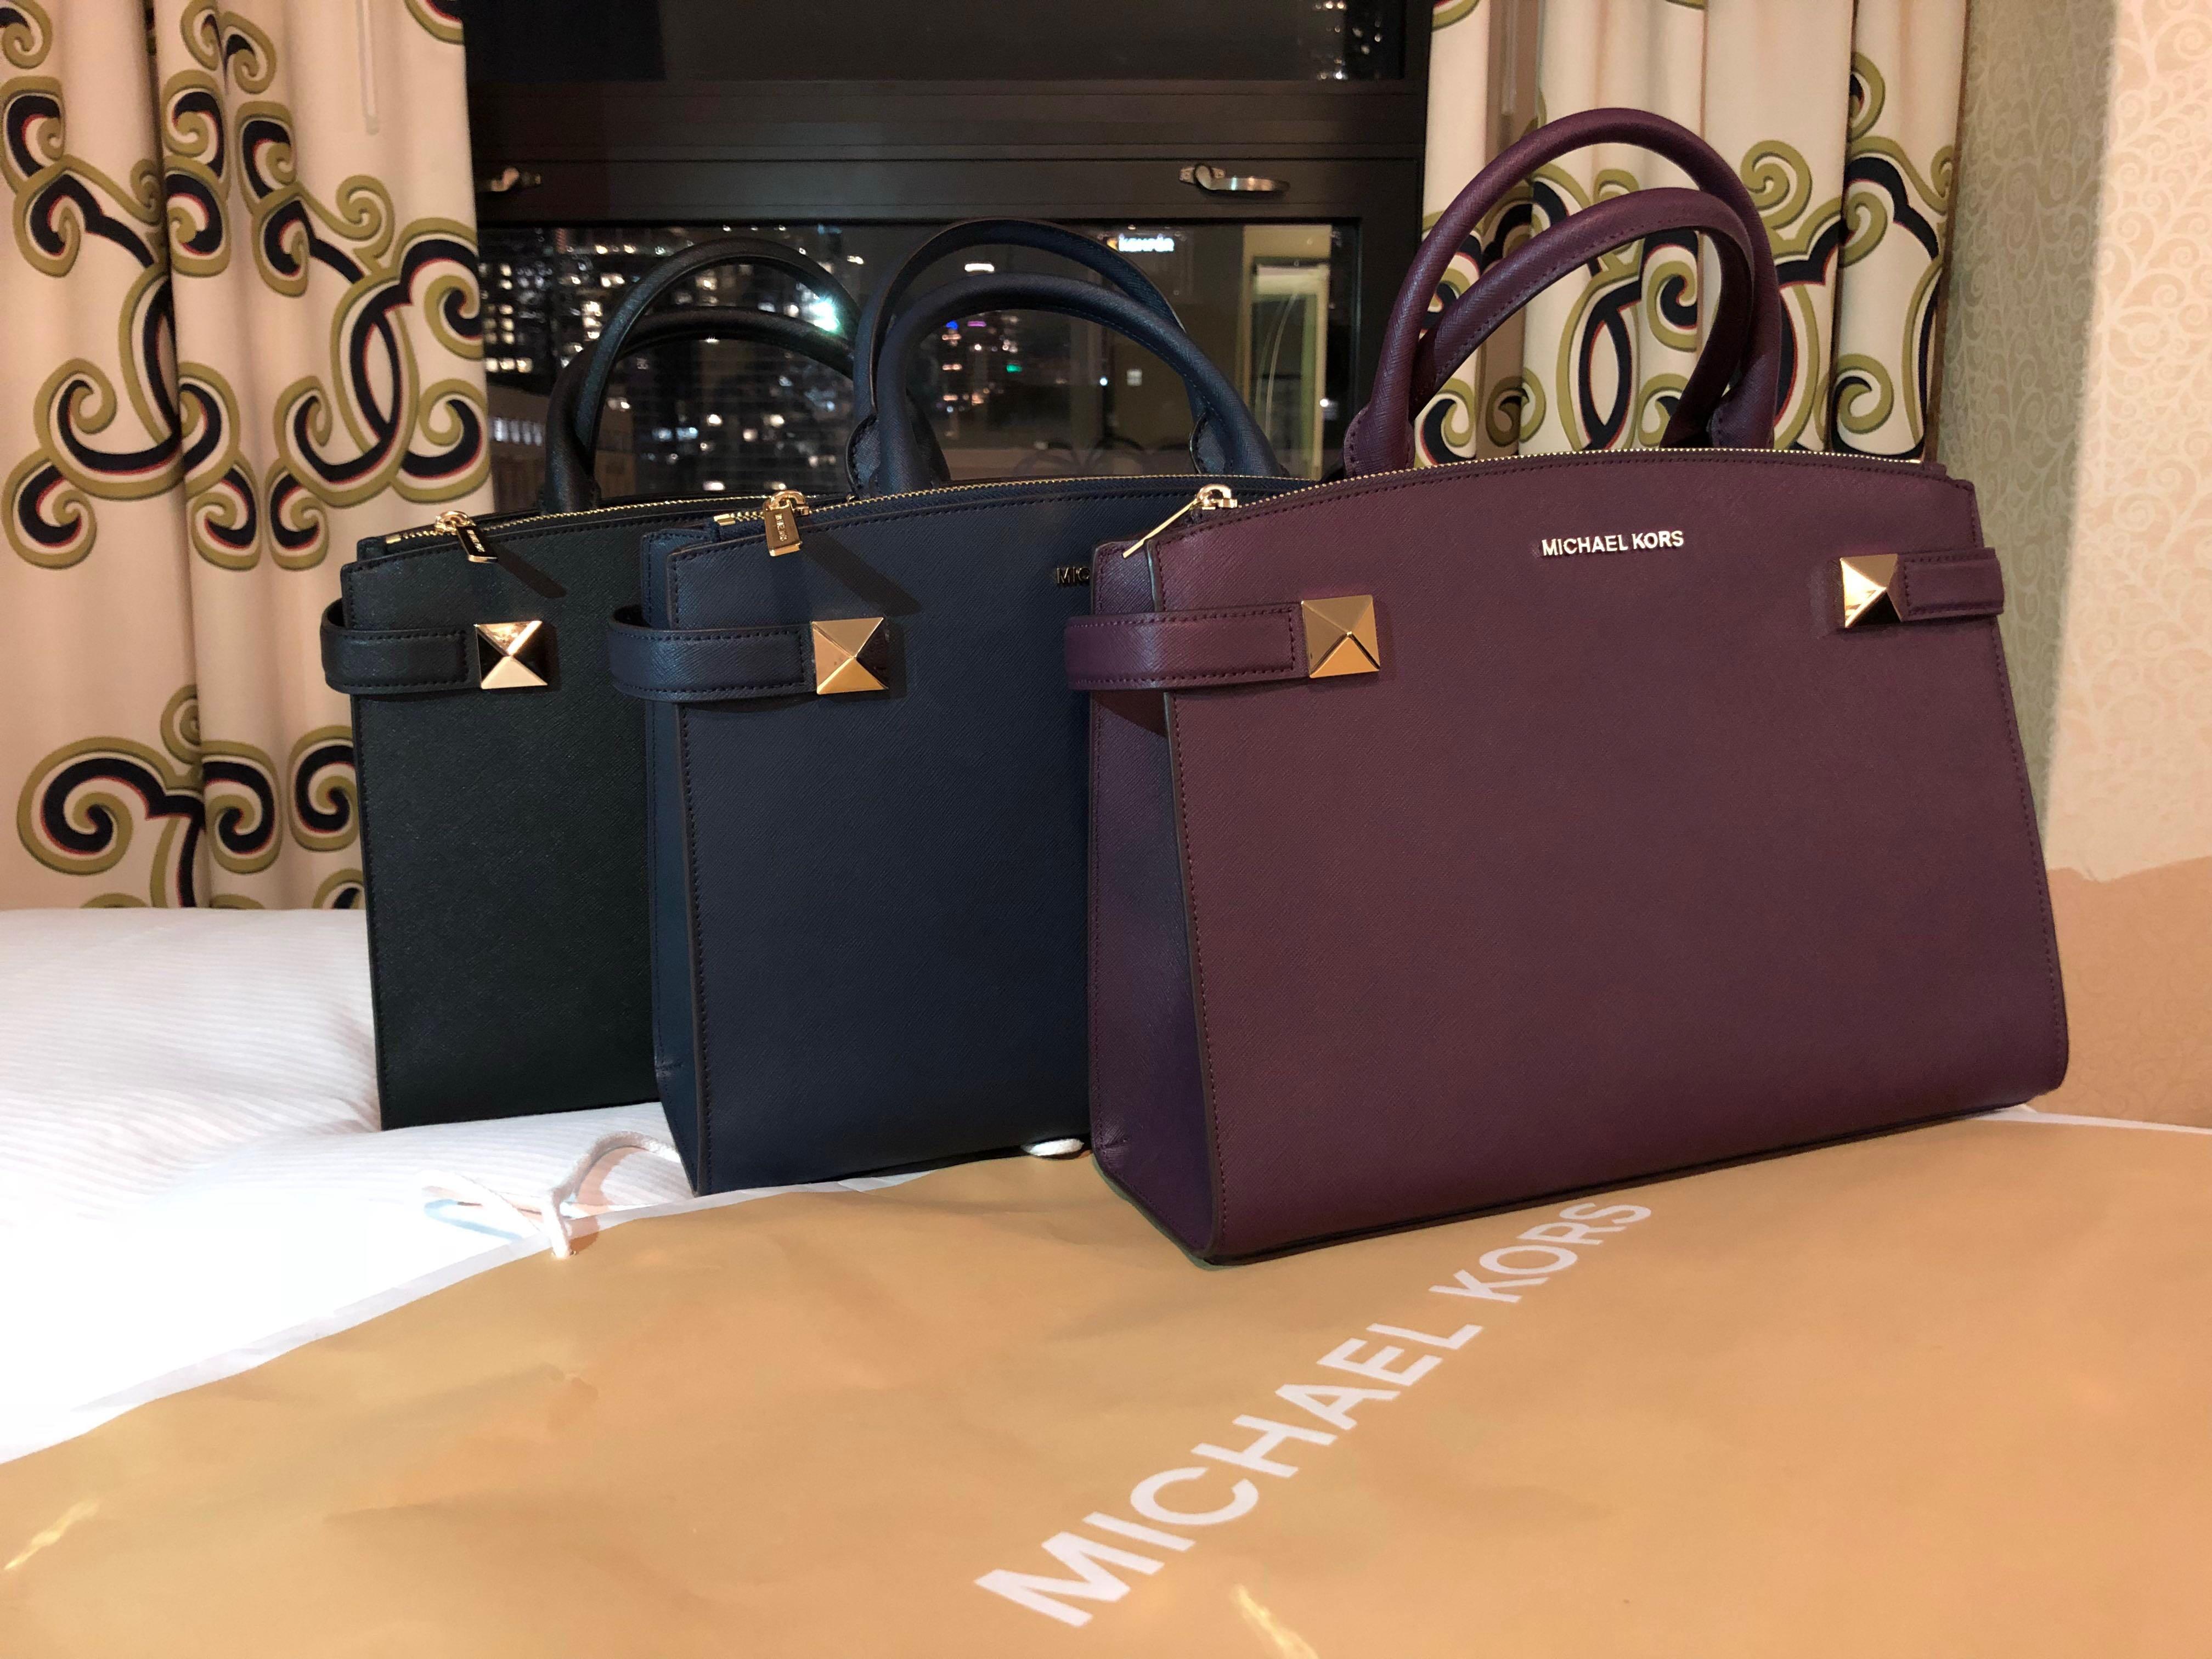 e84c652489399d BN Authentic Michael Kors Karla - MK!, Women's Fashion, Bags & Wallets,  Handbags on Carousell